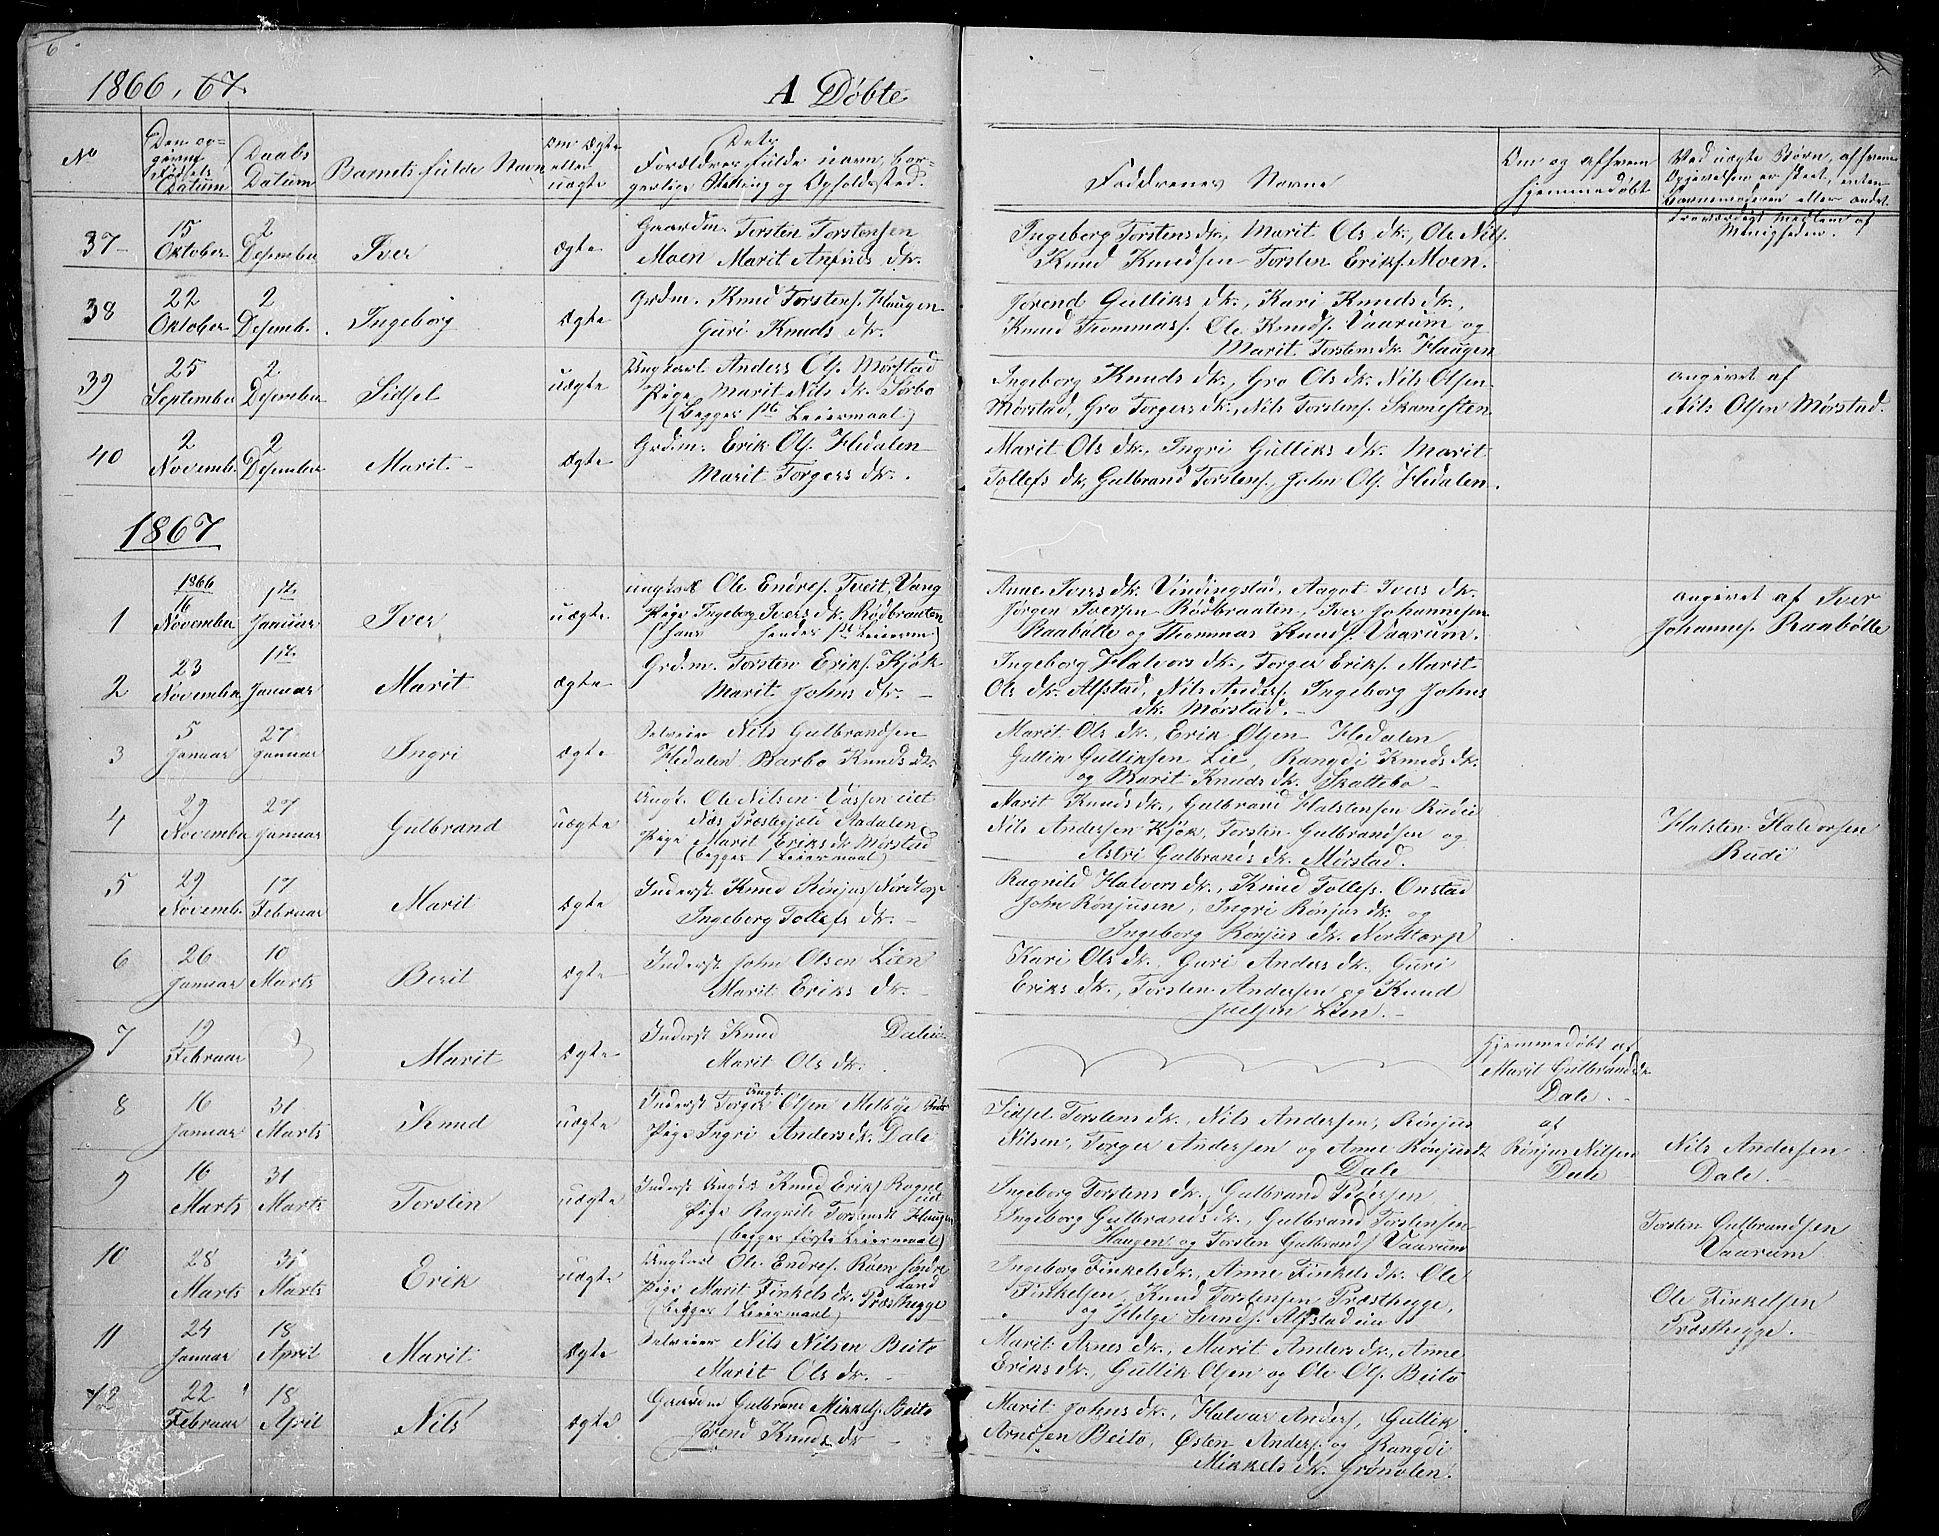 SAH, Øystre Slidre prestekontor, Klokkerbok nr. 1, 1866-1886, s. 6-7